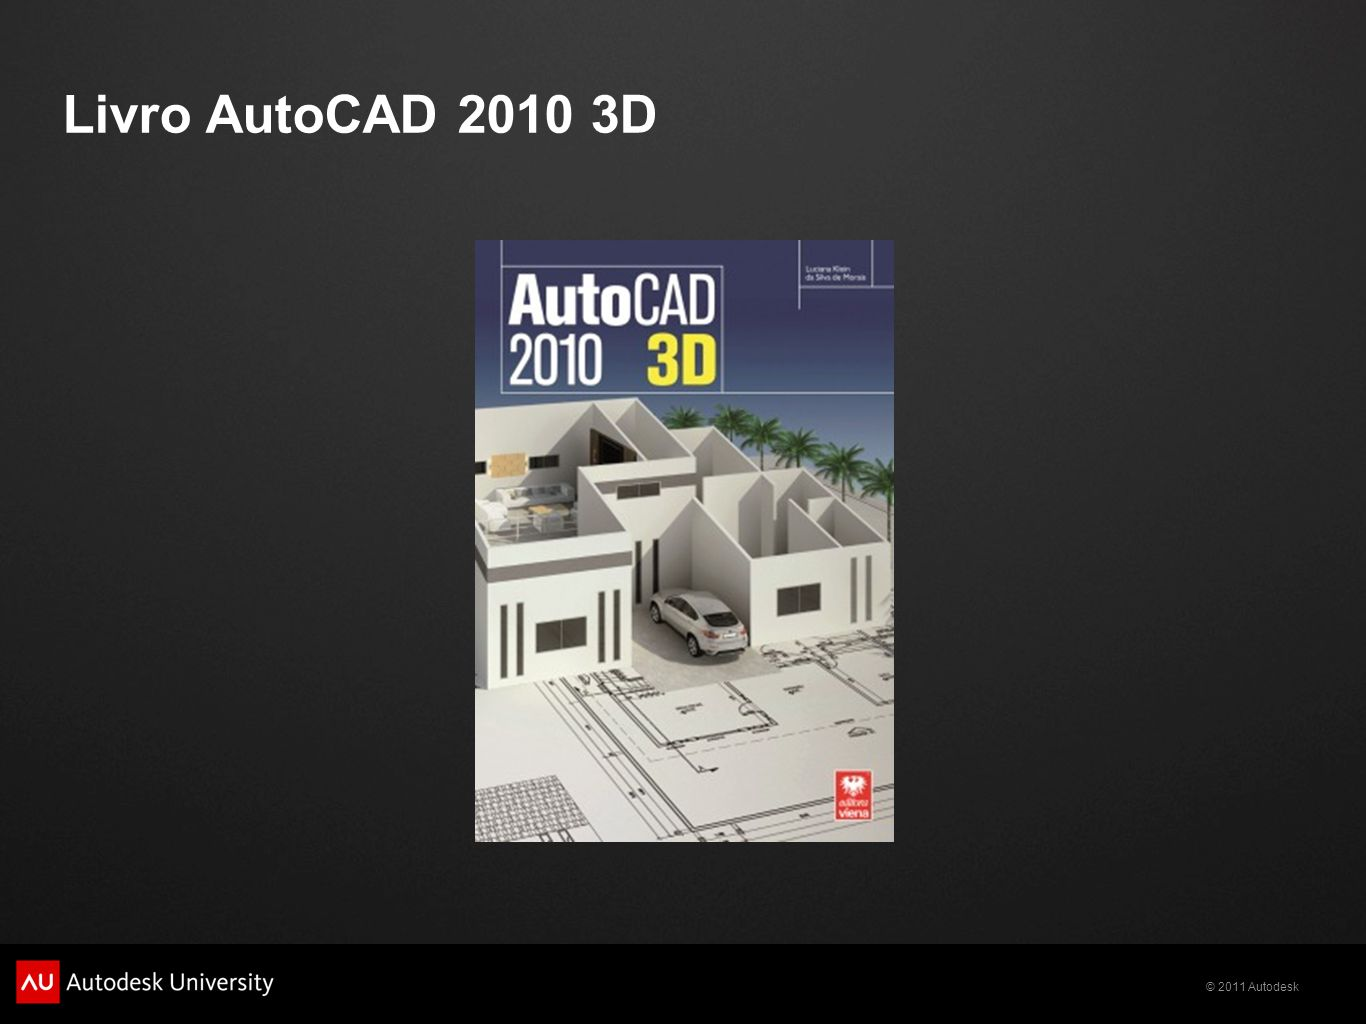 Livro AutoCAD 2010 3D